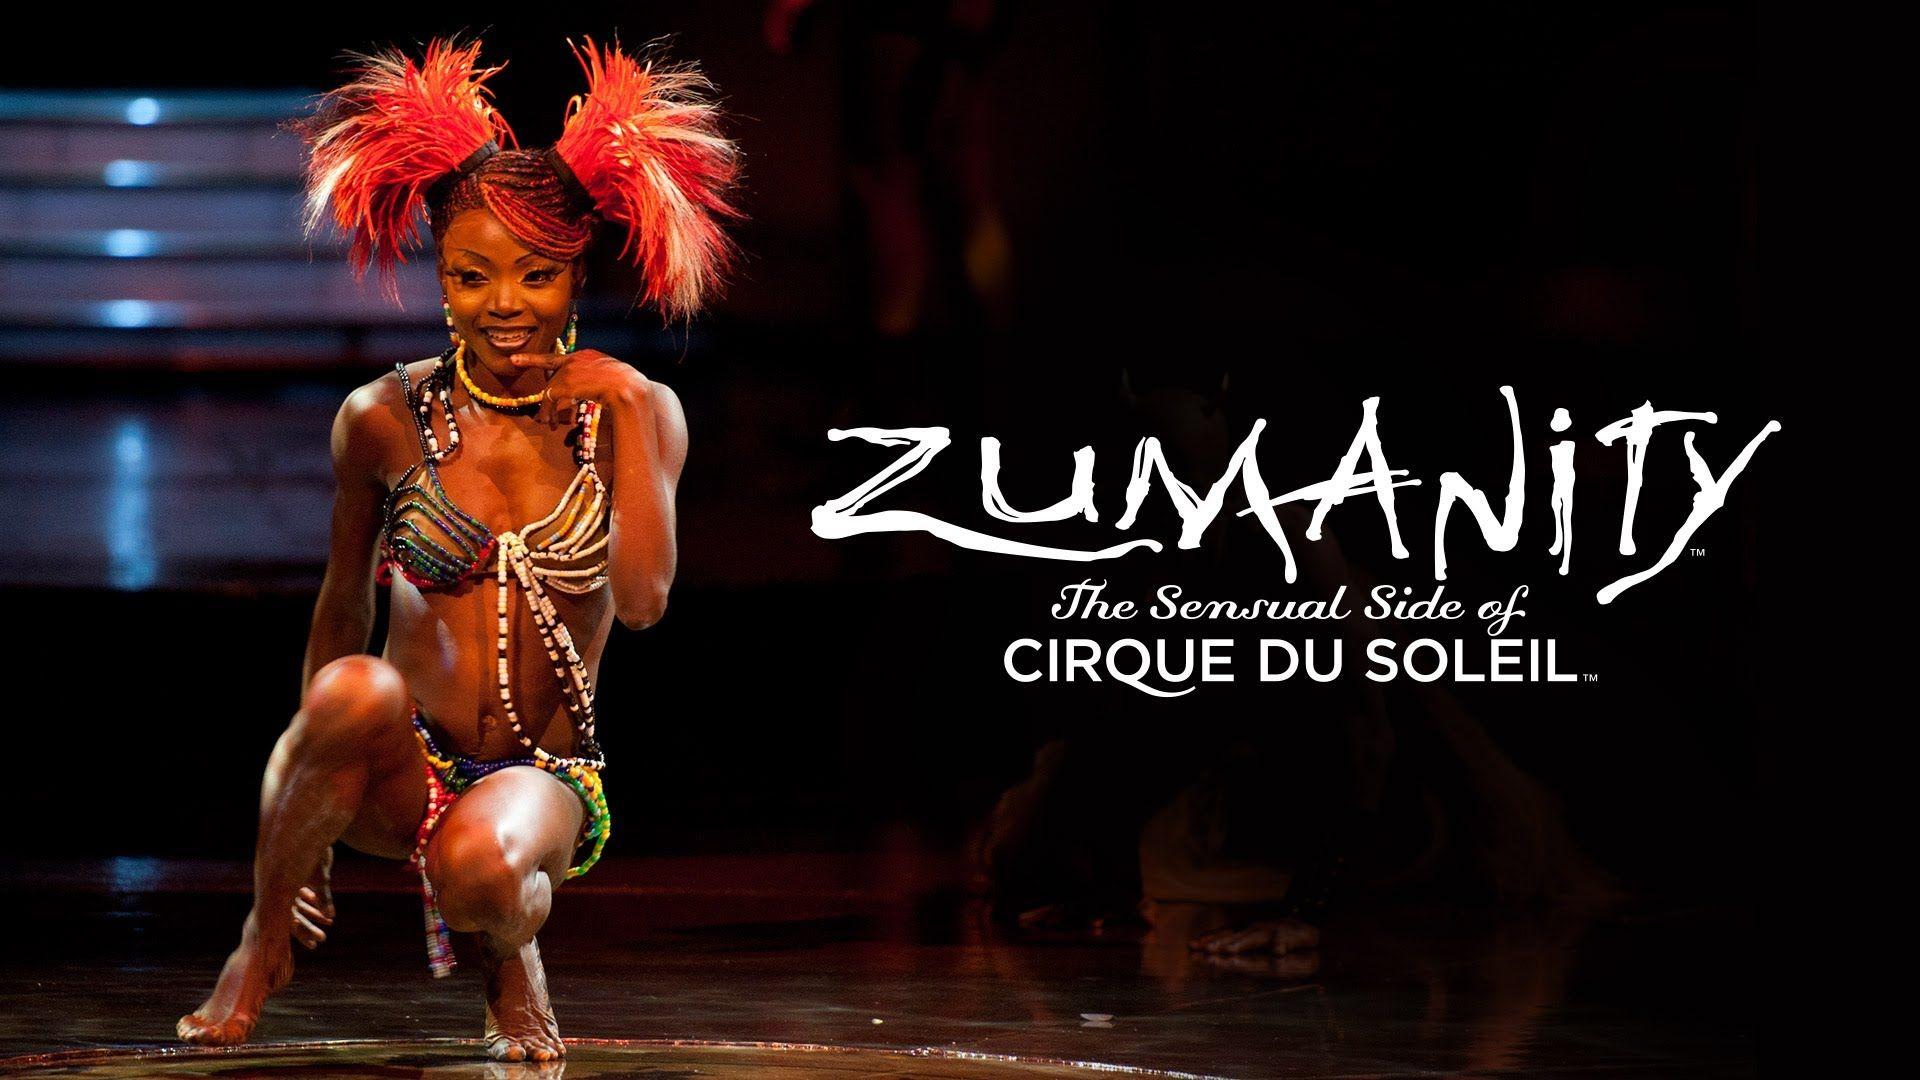 Zumanity By Cirque Du Soleil - Official Trailer Playlist-9871